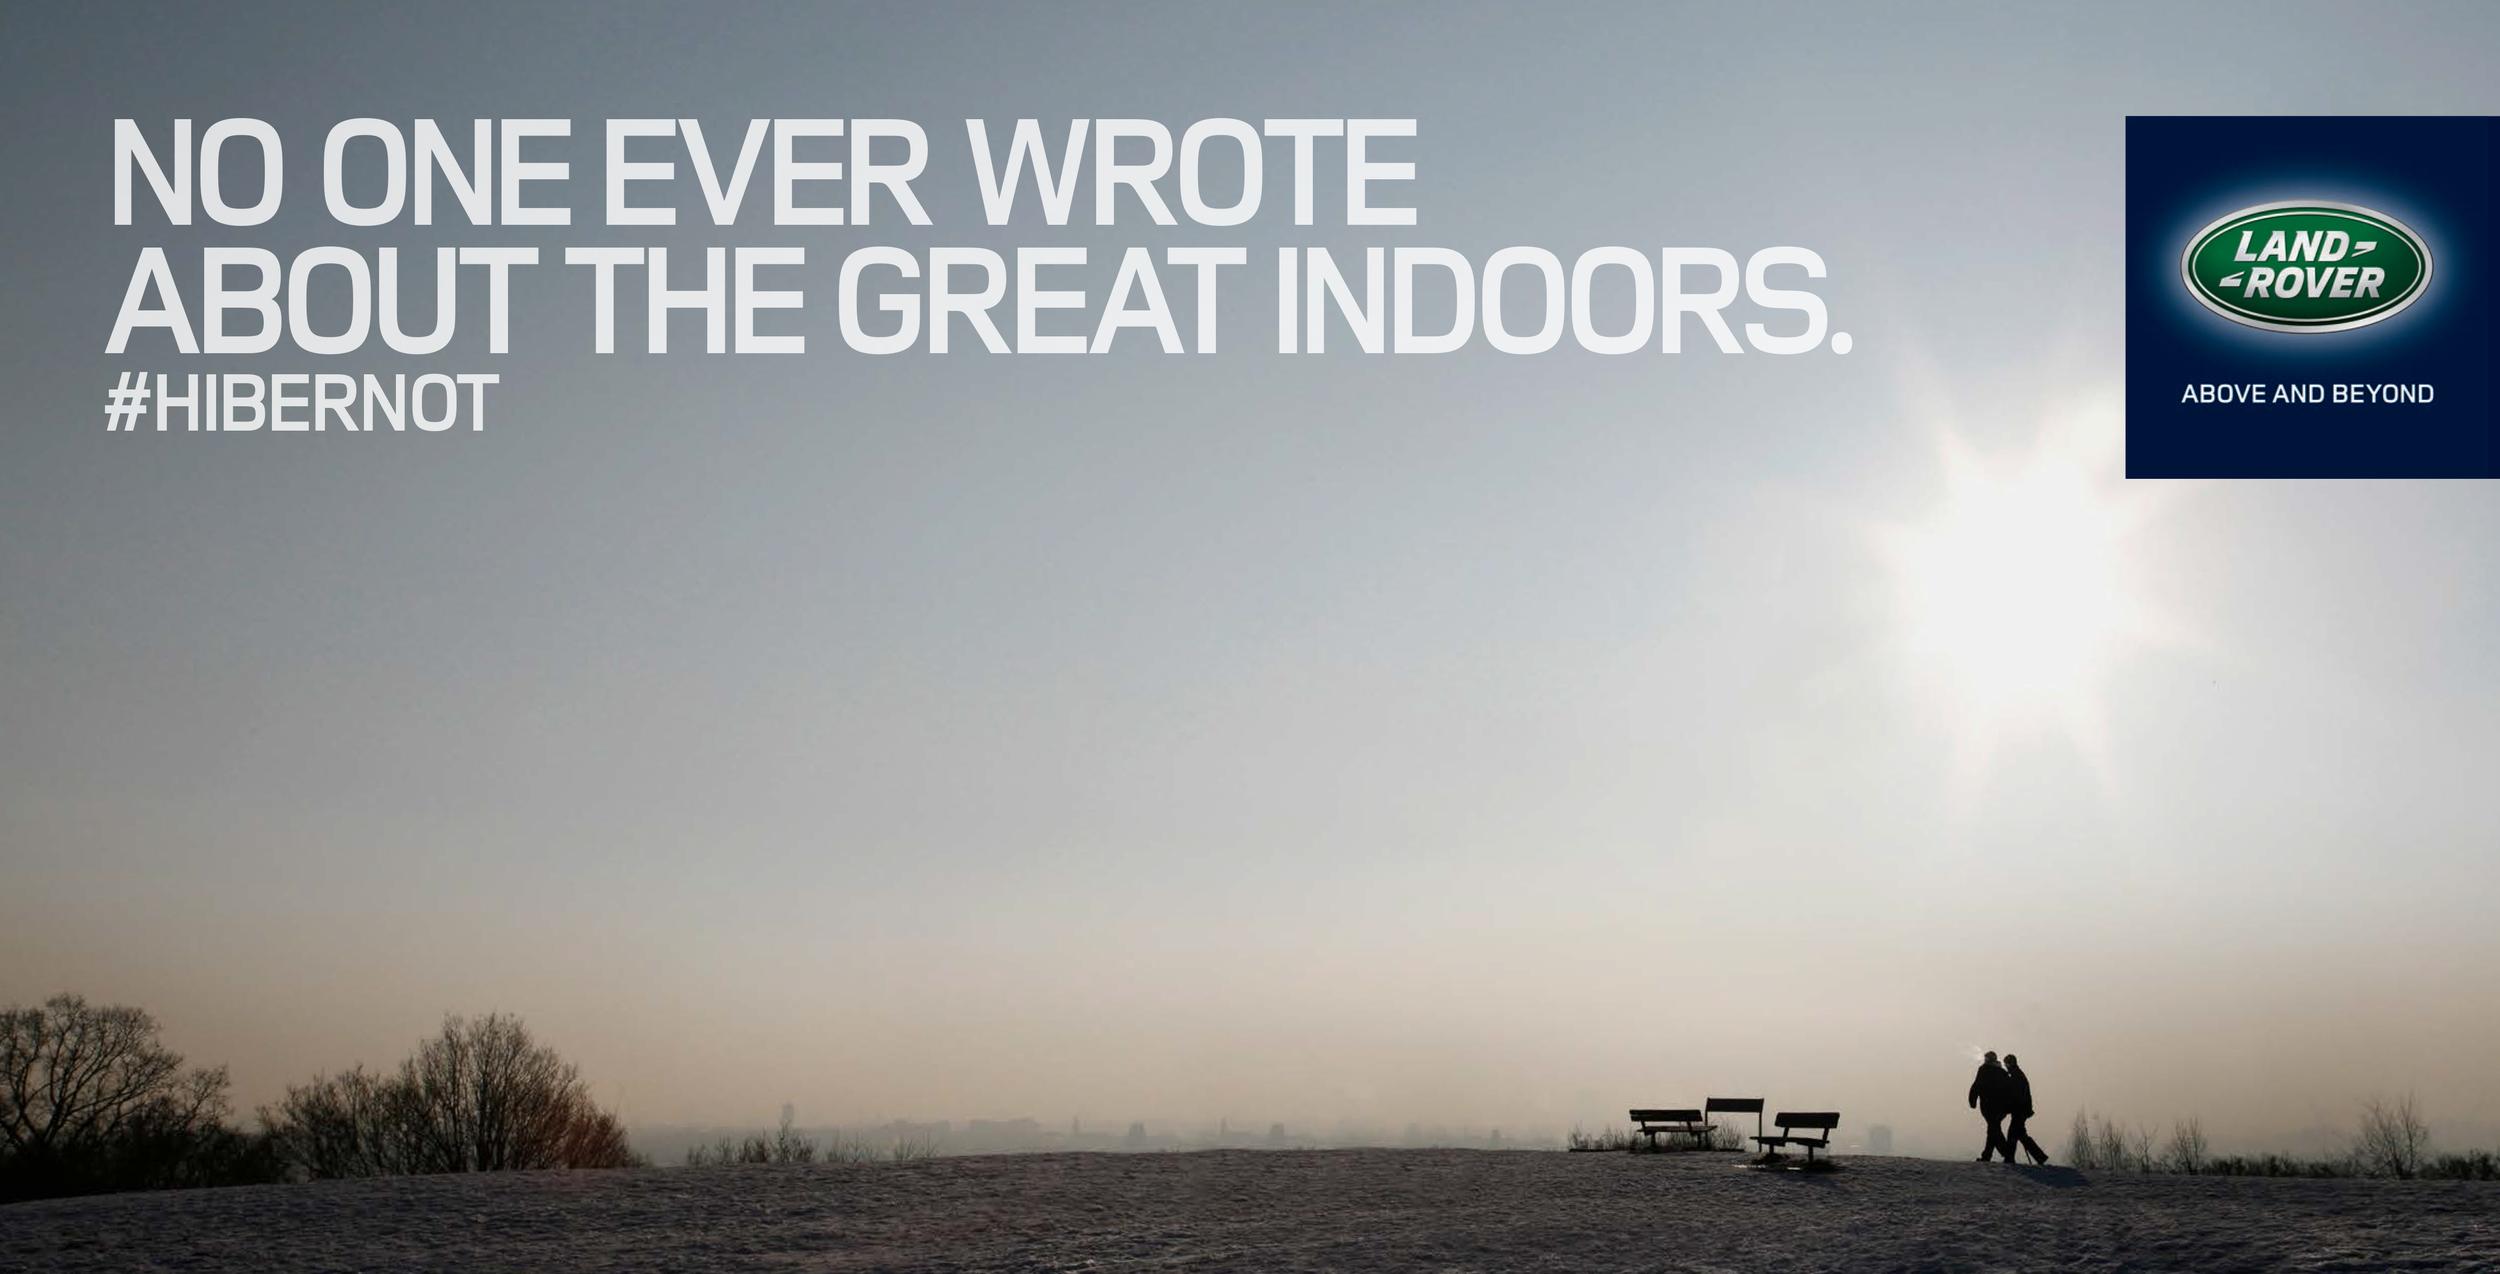 Hibernot-posters-11.jpg